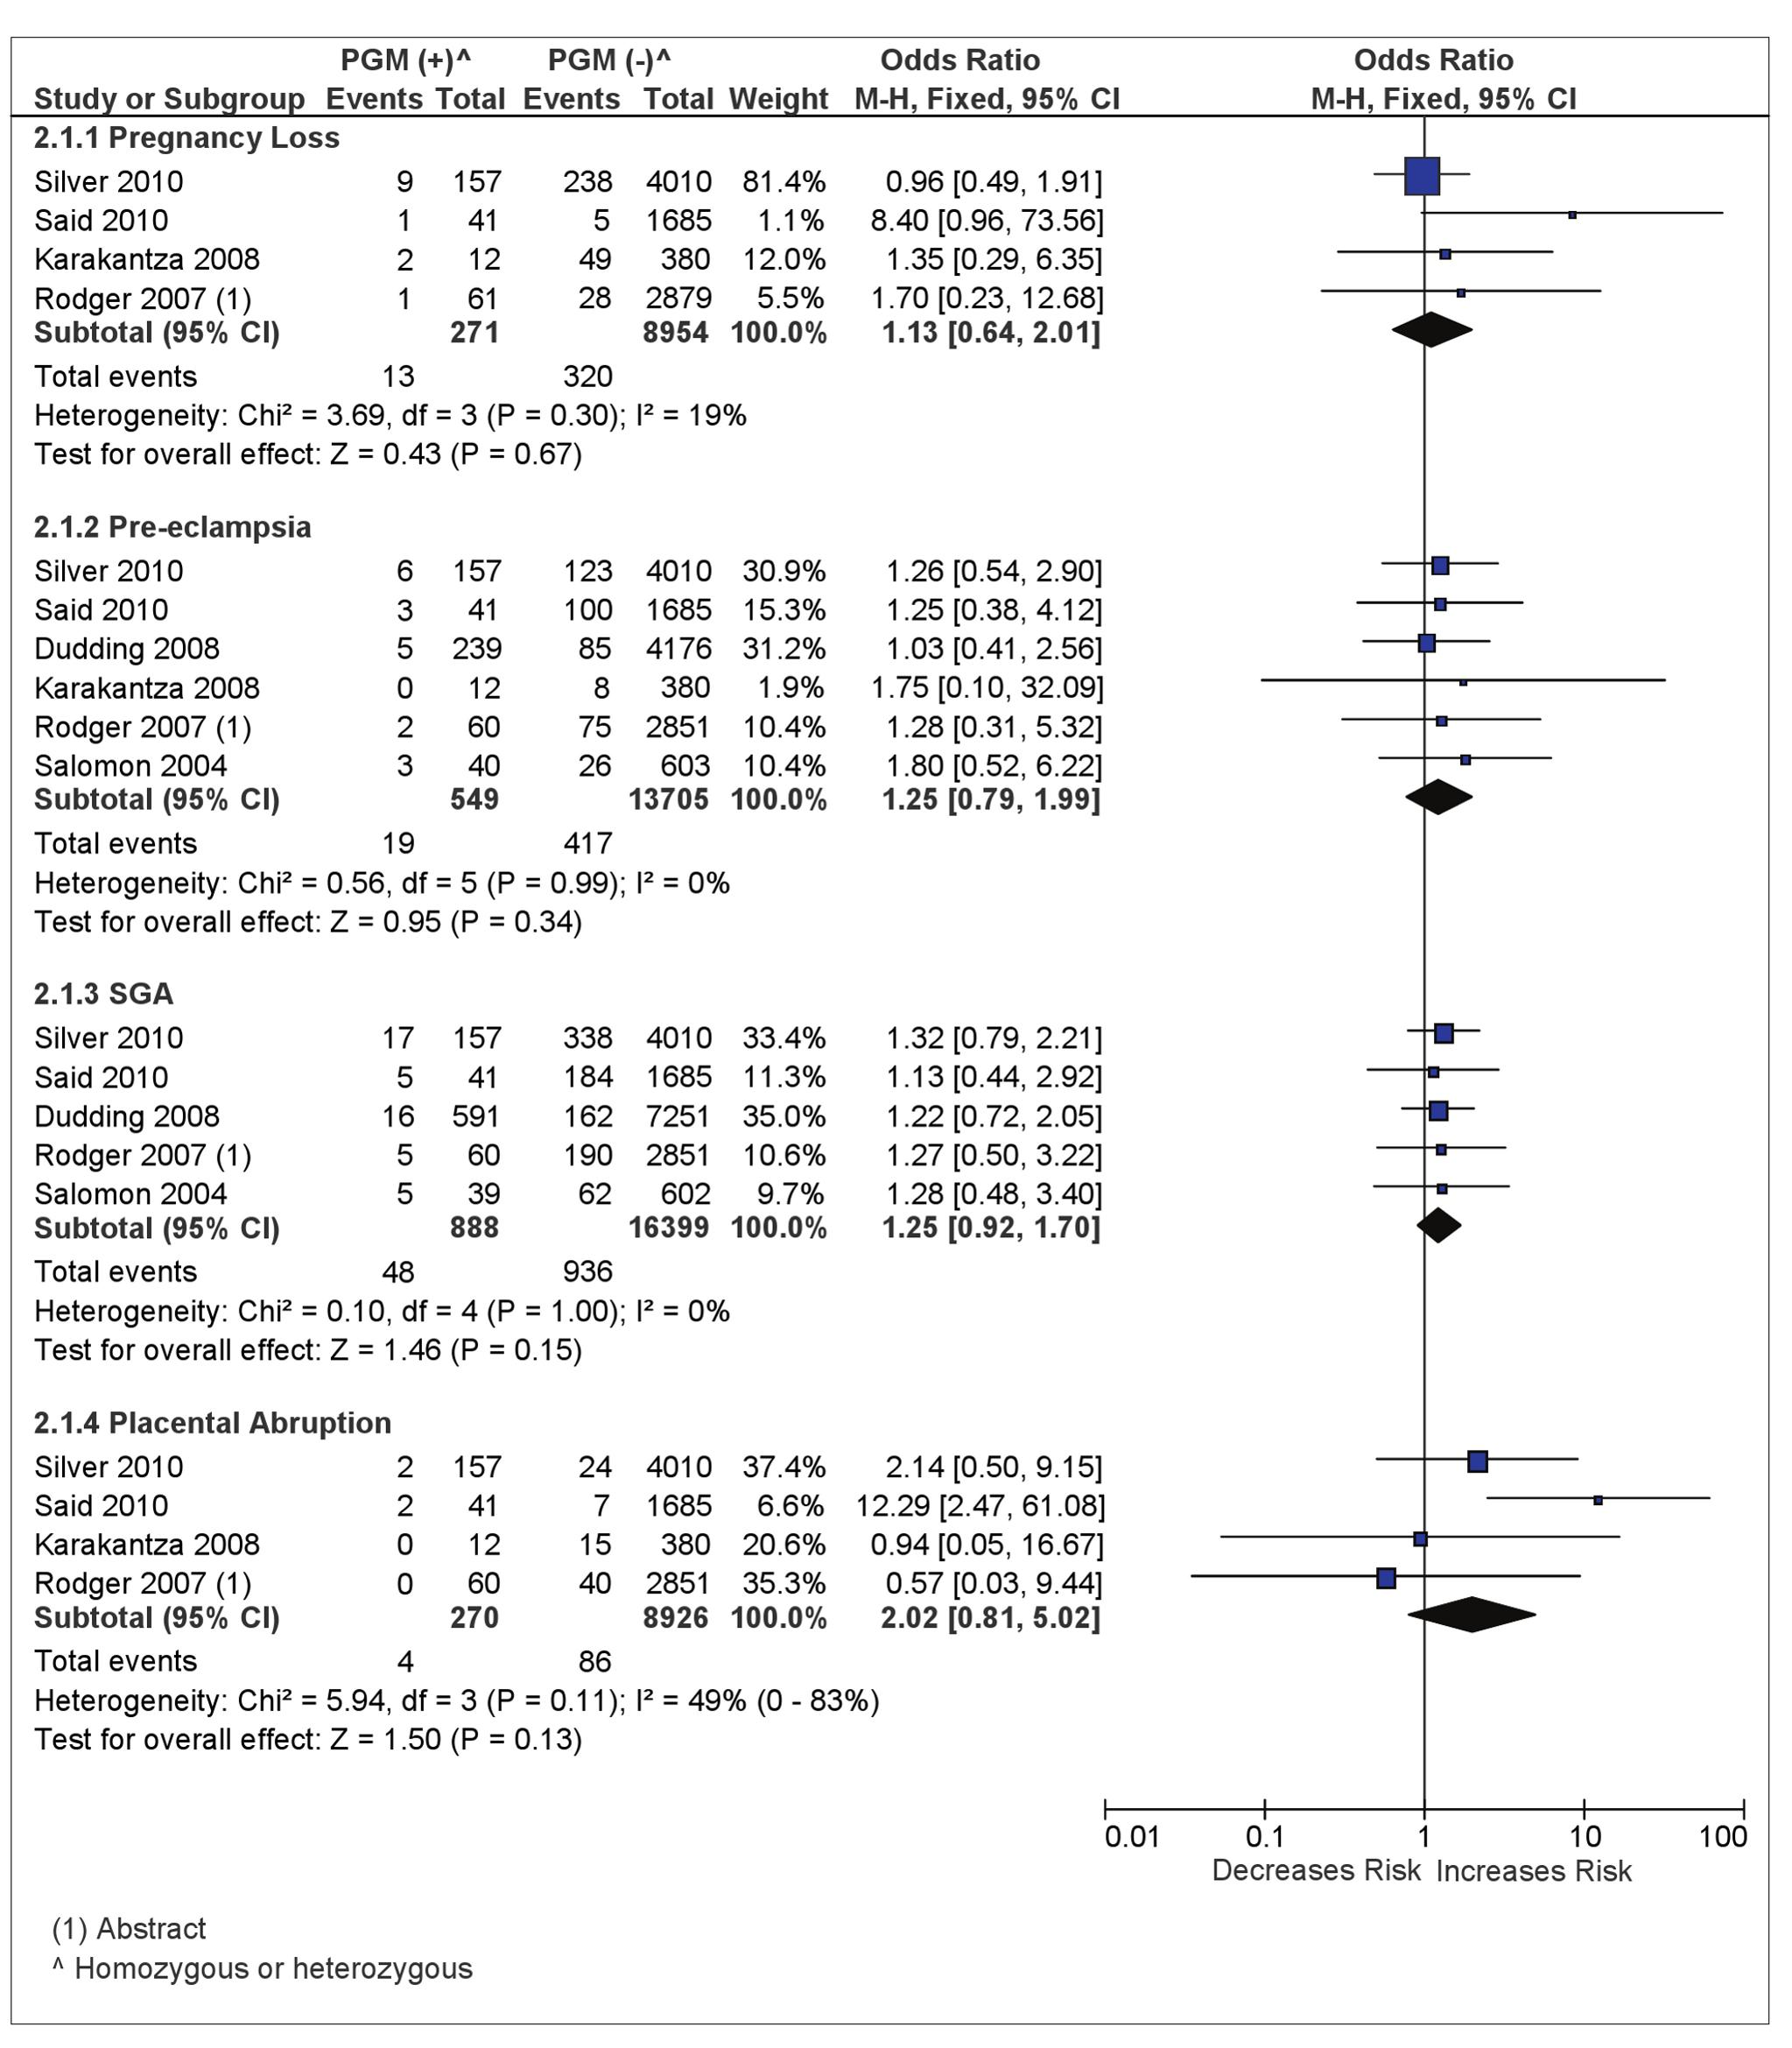 Odds of placenta-mediated pregnancy complications in PGM (homozygous or heterozygous)-positive women.